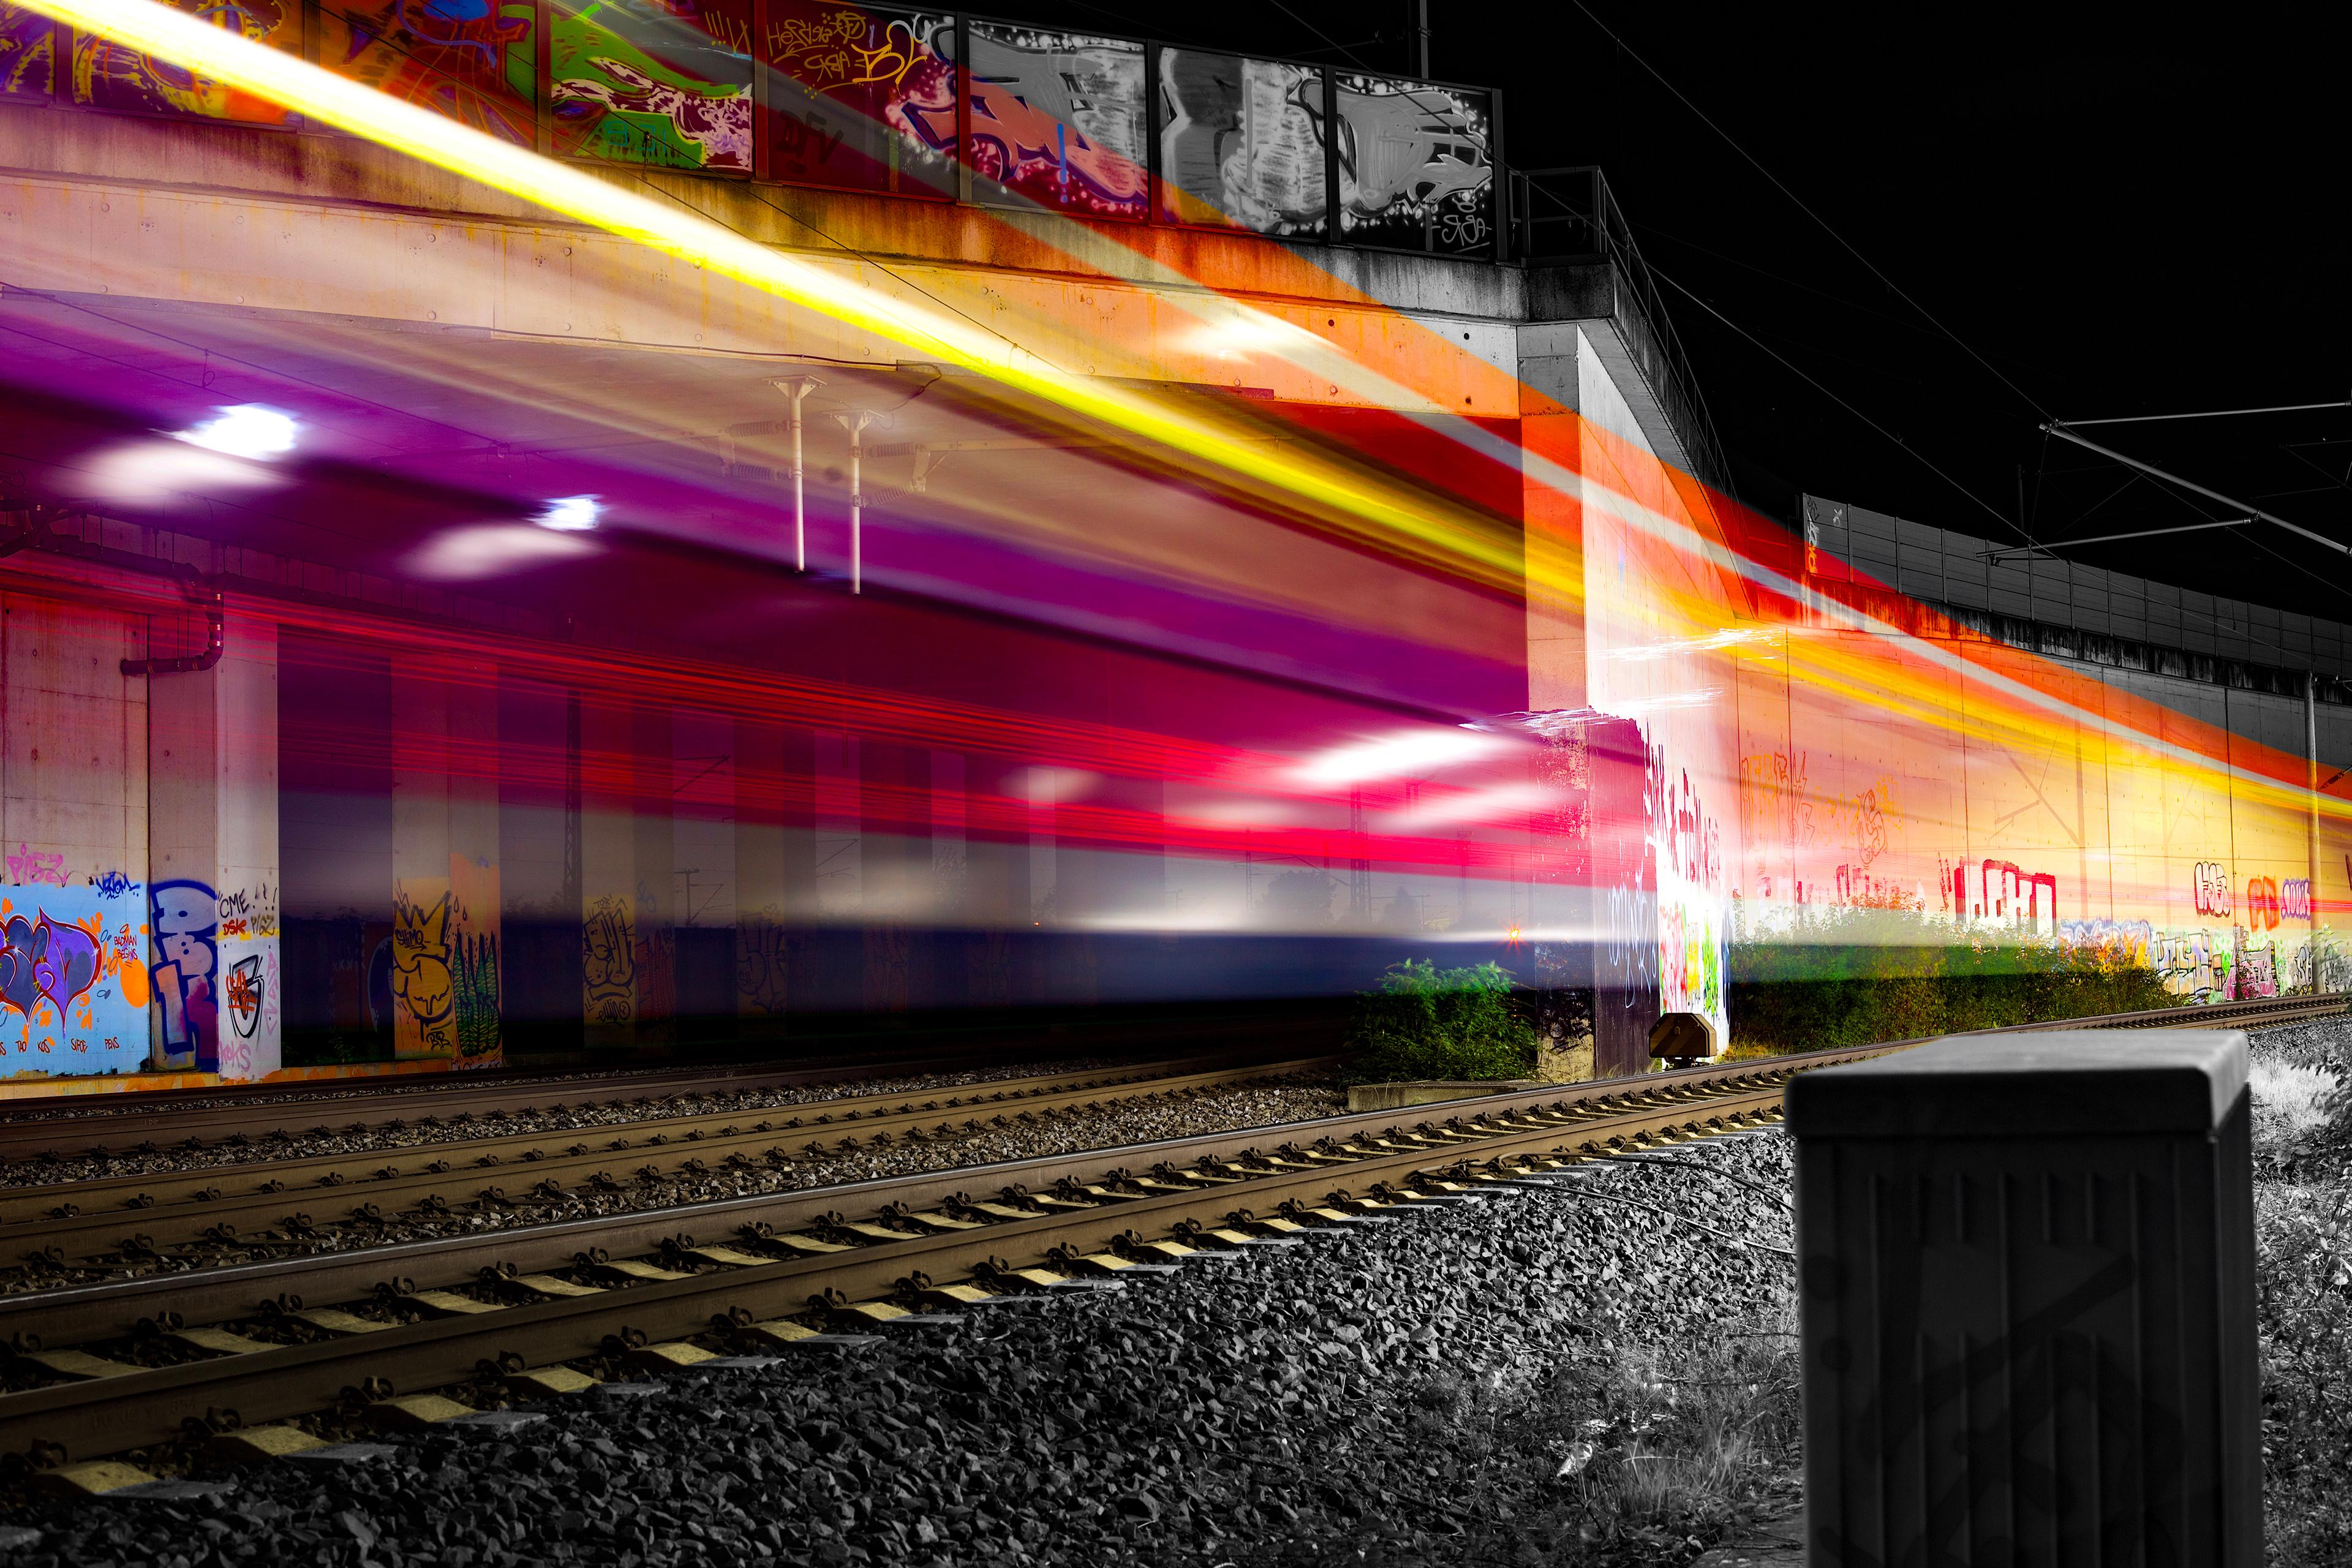 train long exposure lights photography 1574938646 - Train Long Exposure Lights Photography -